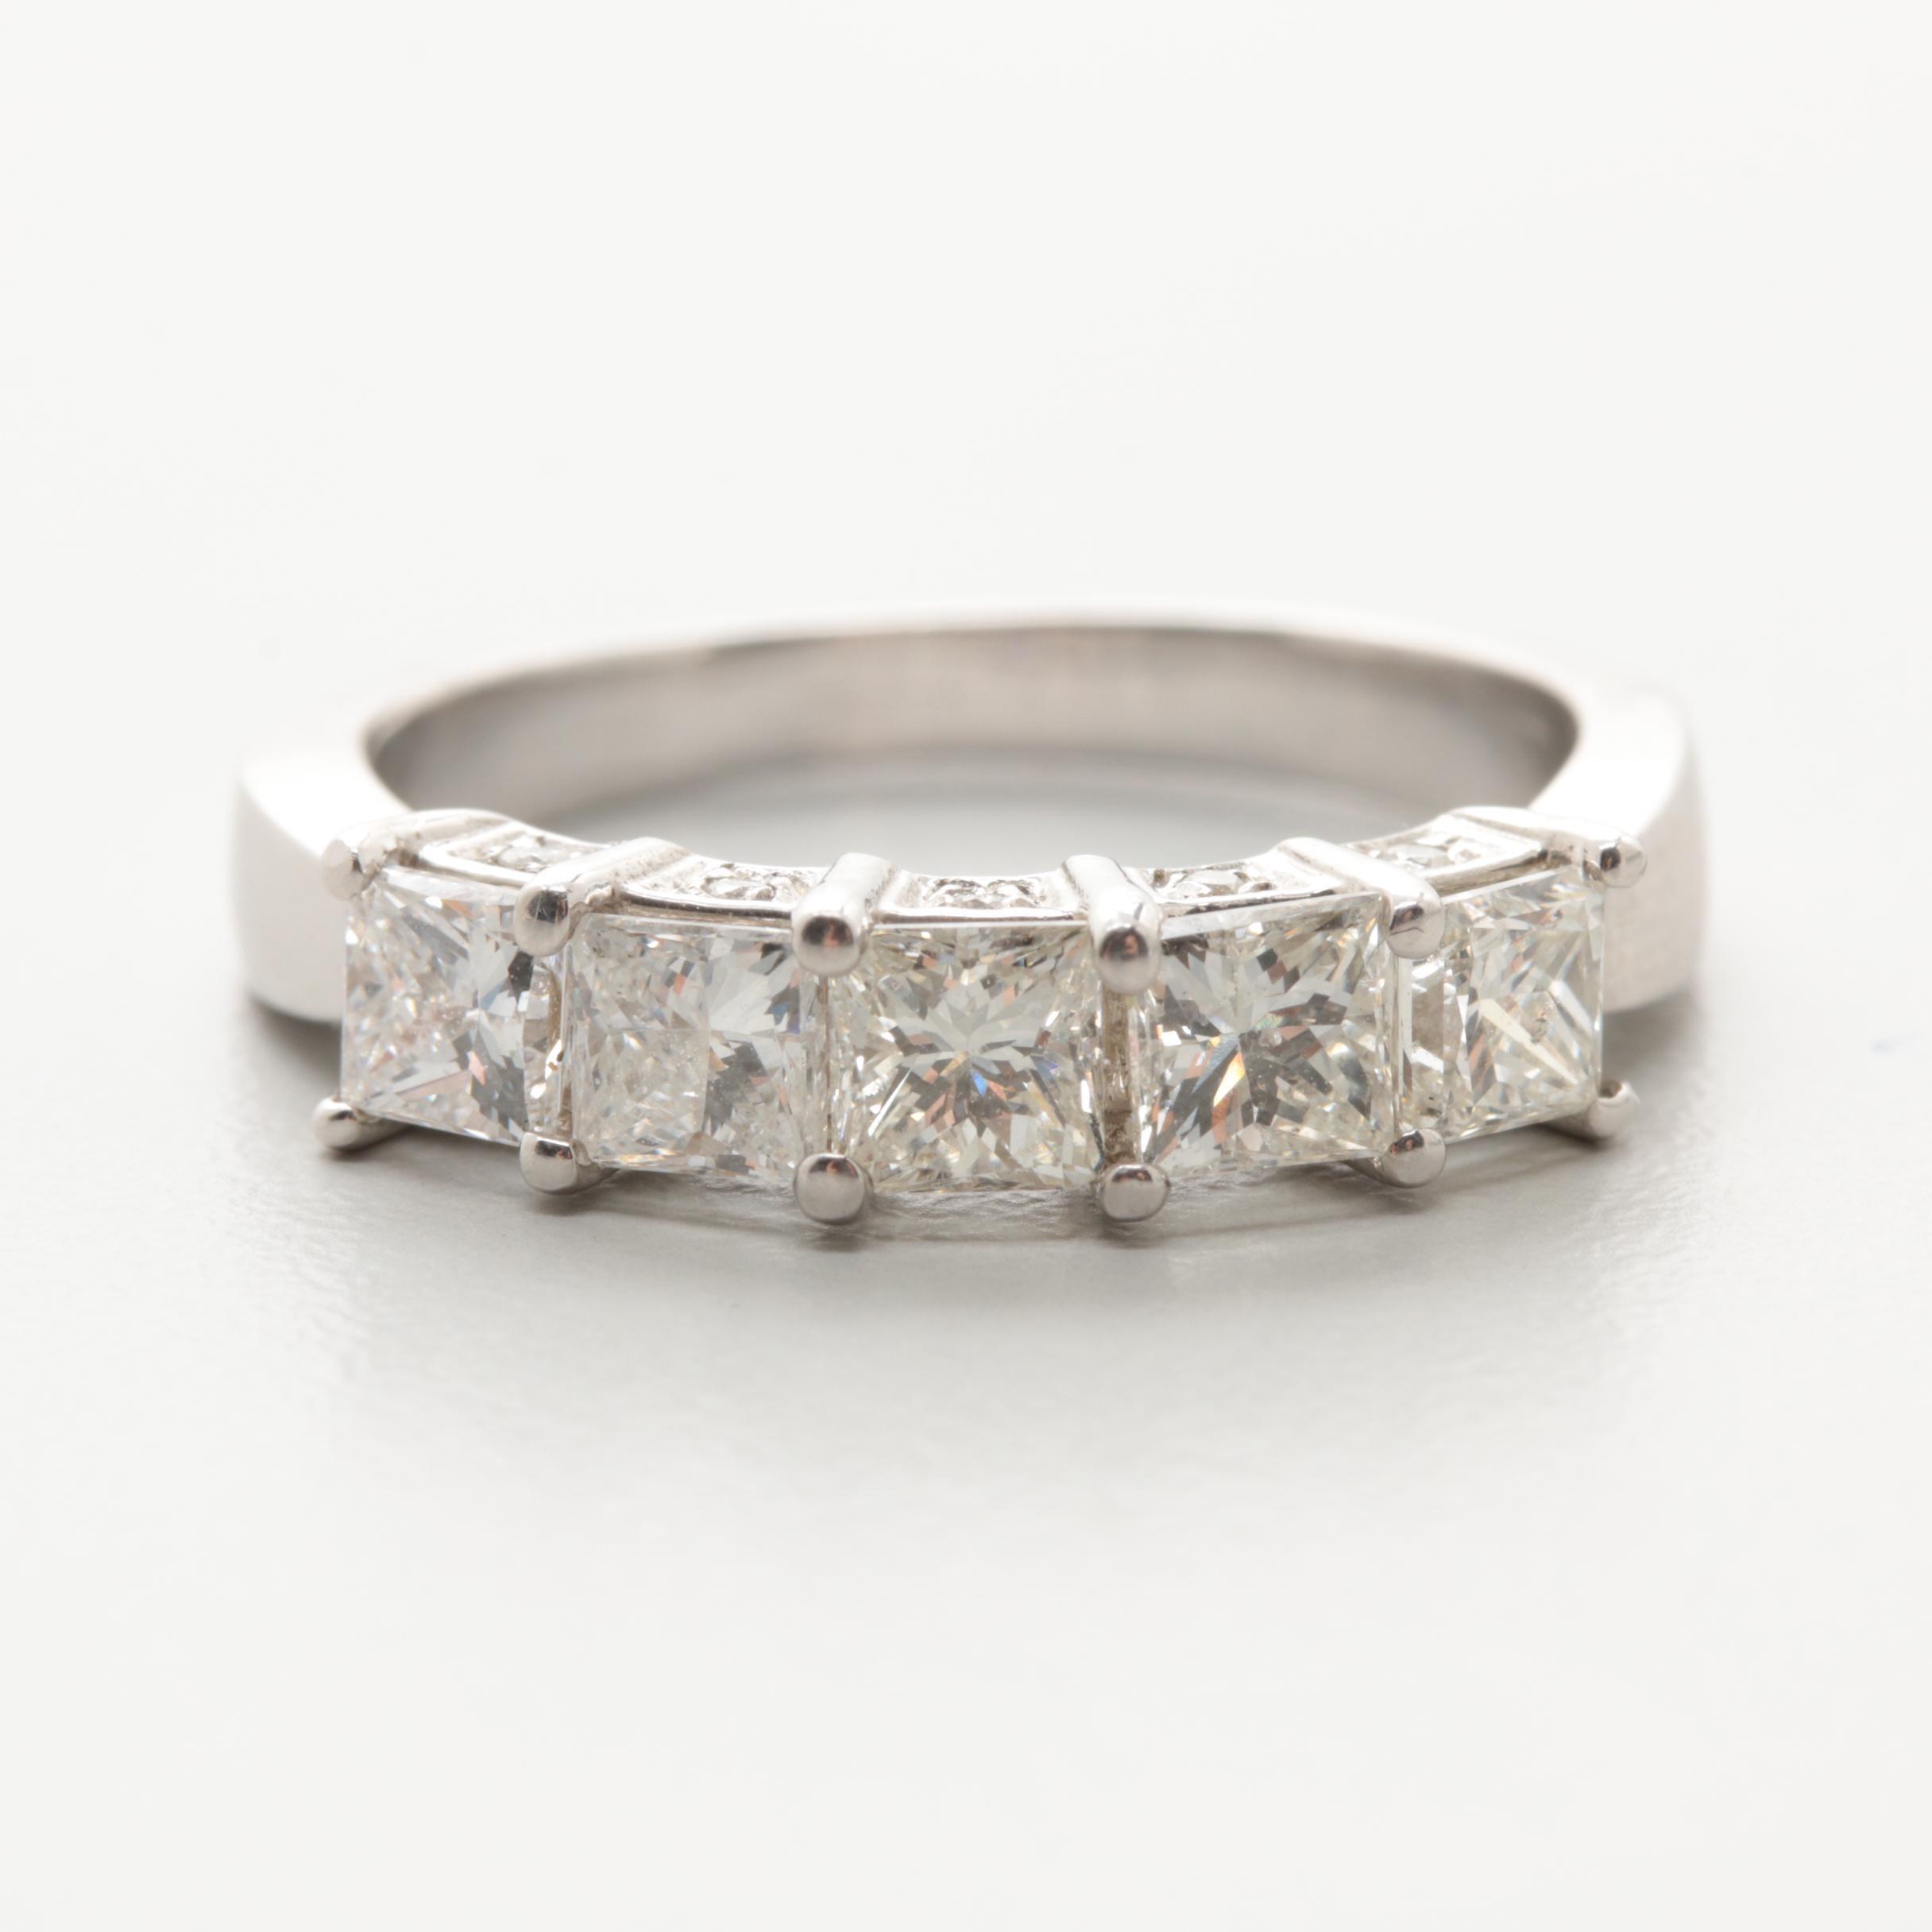 14K White Gold 1.50 CTW Diamond Ring